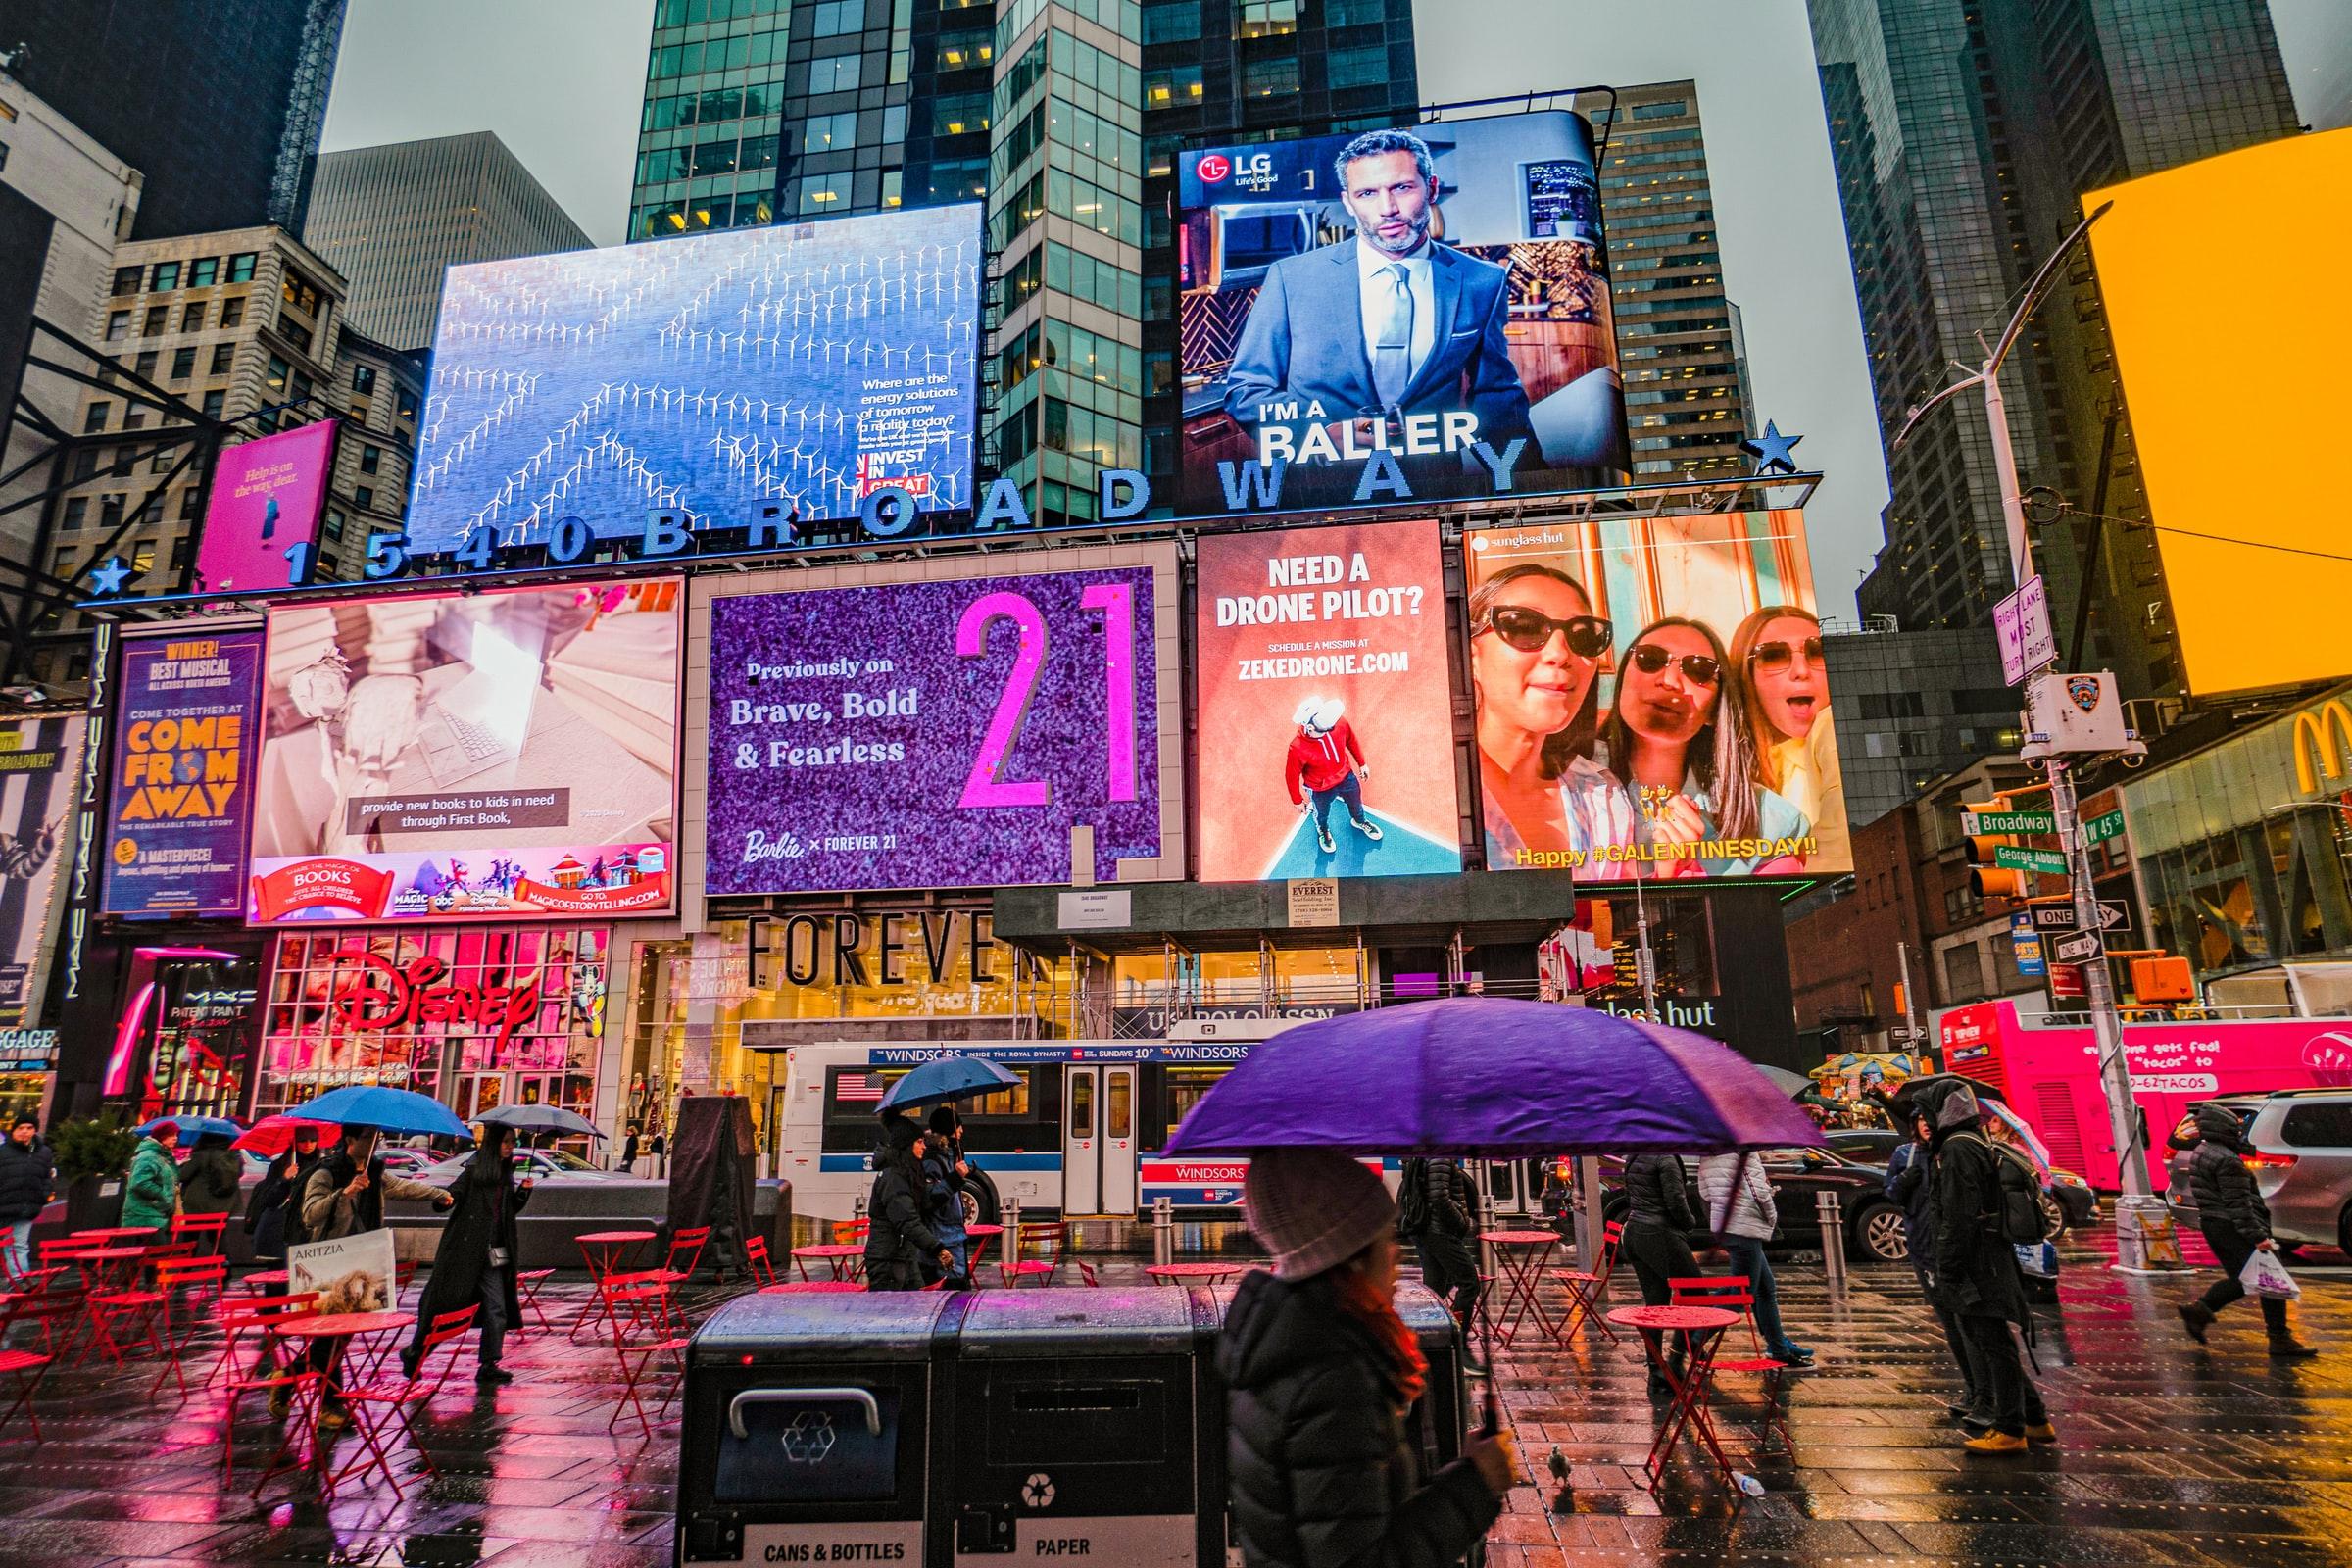 Image of programmatic DOOH billboards showing ads businesses have bid on